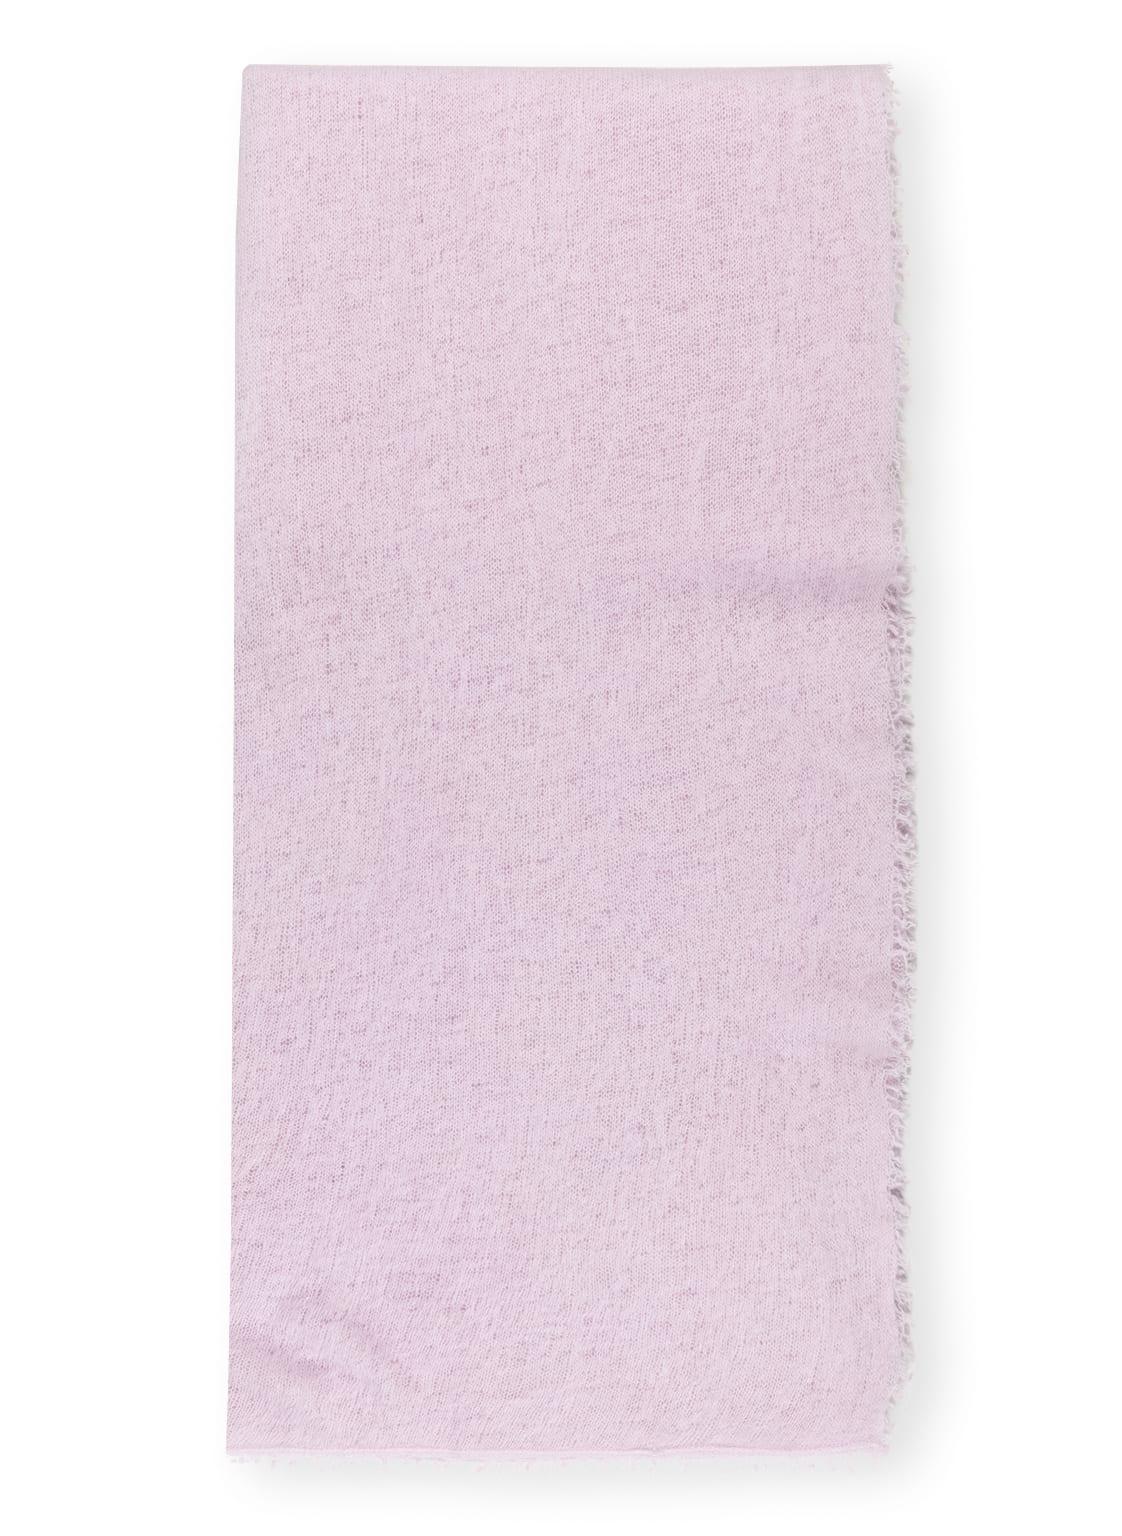 Image of Bakaree Cashmere-Schal violett